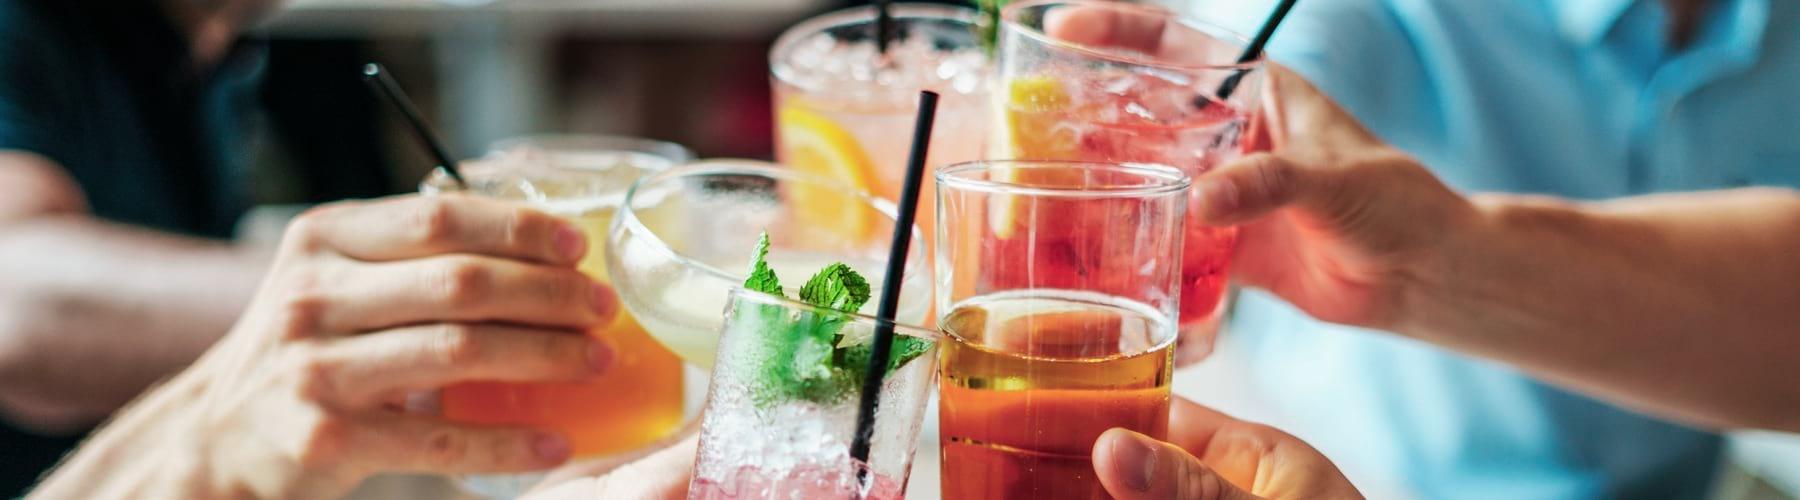 Cocktails in Evolve Lounge